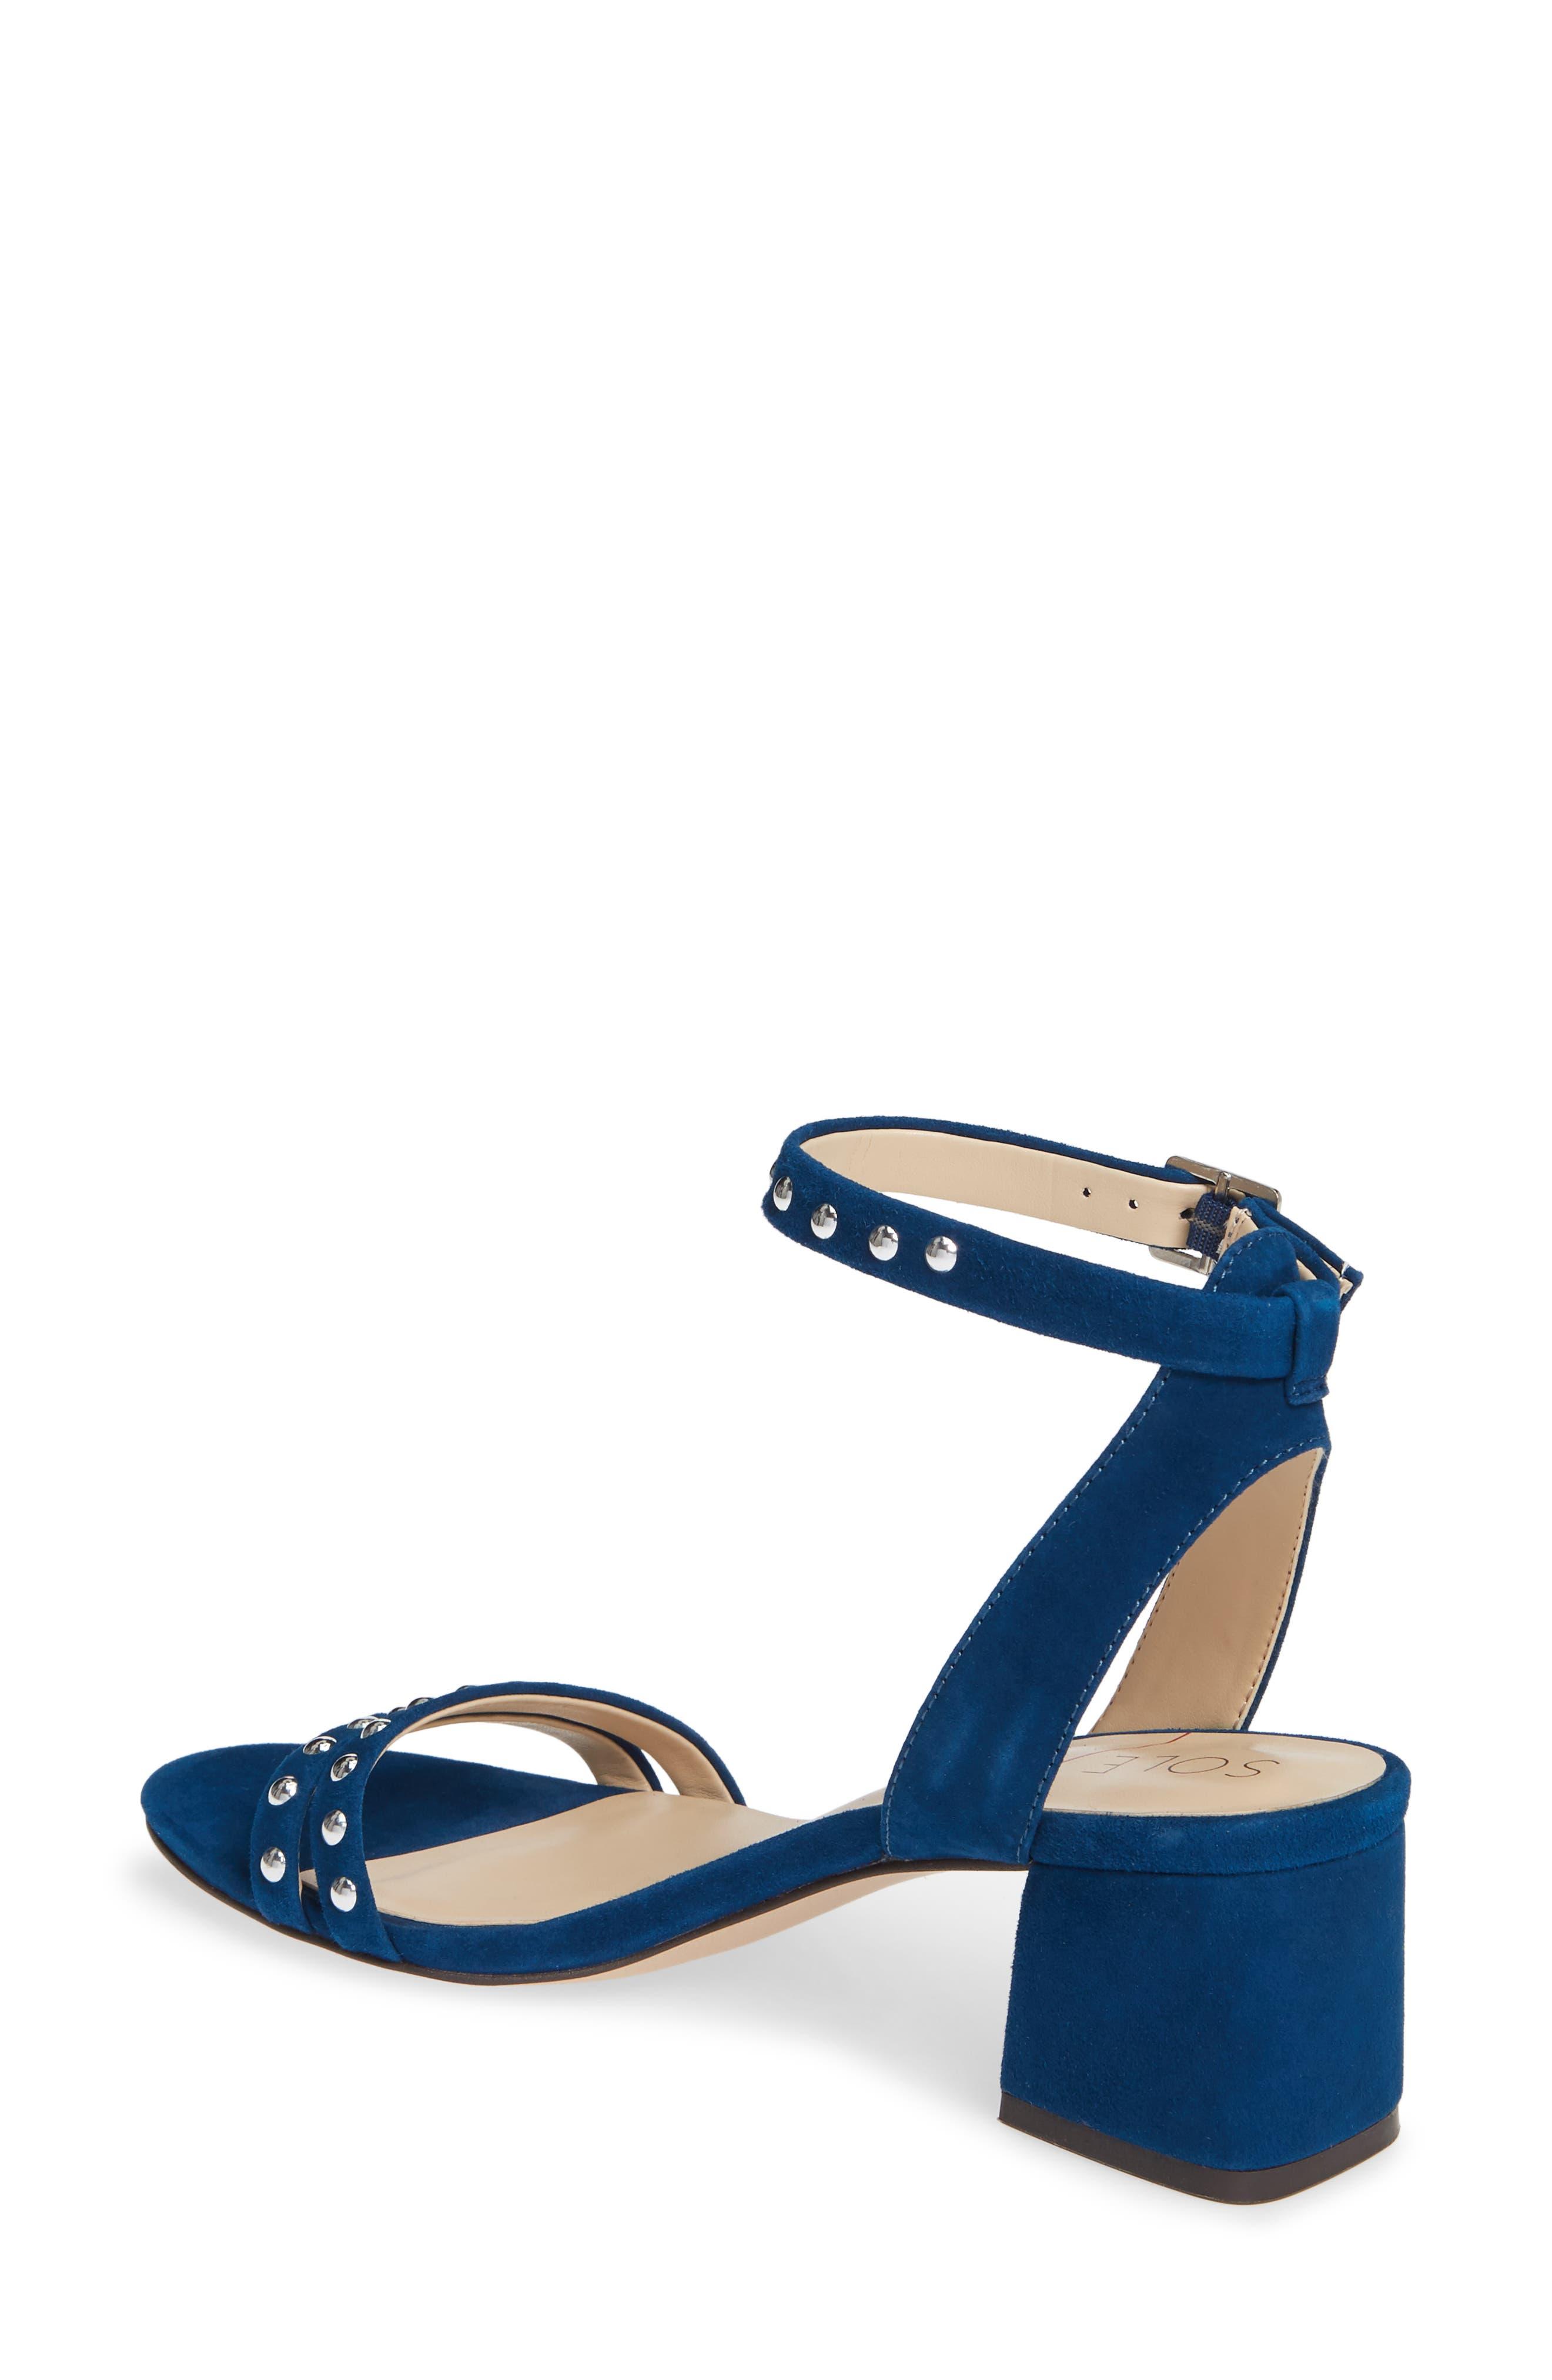 Hezzter Studded Sandal,                             Alternate thumbnail 2, color,                             CERULEAN BLUE SUEDE